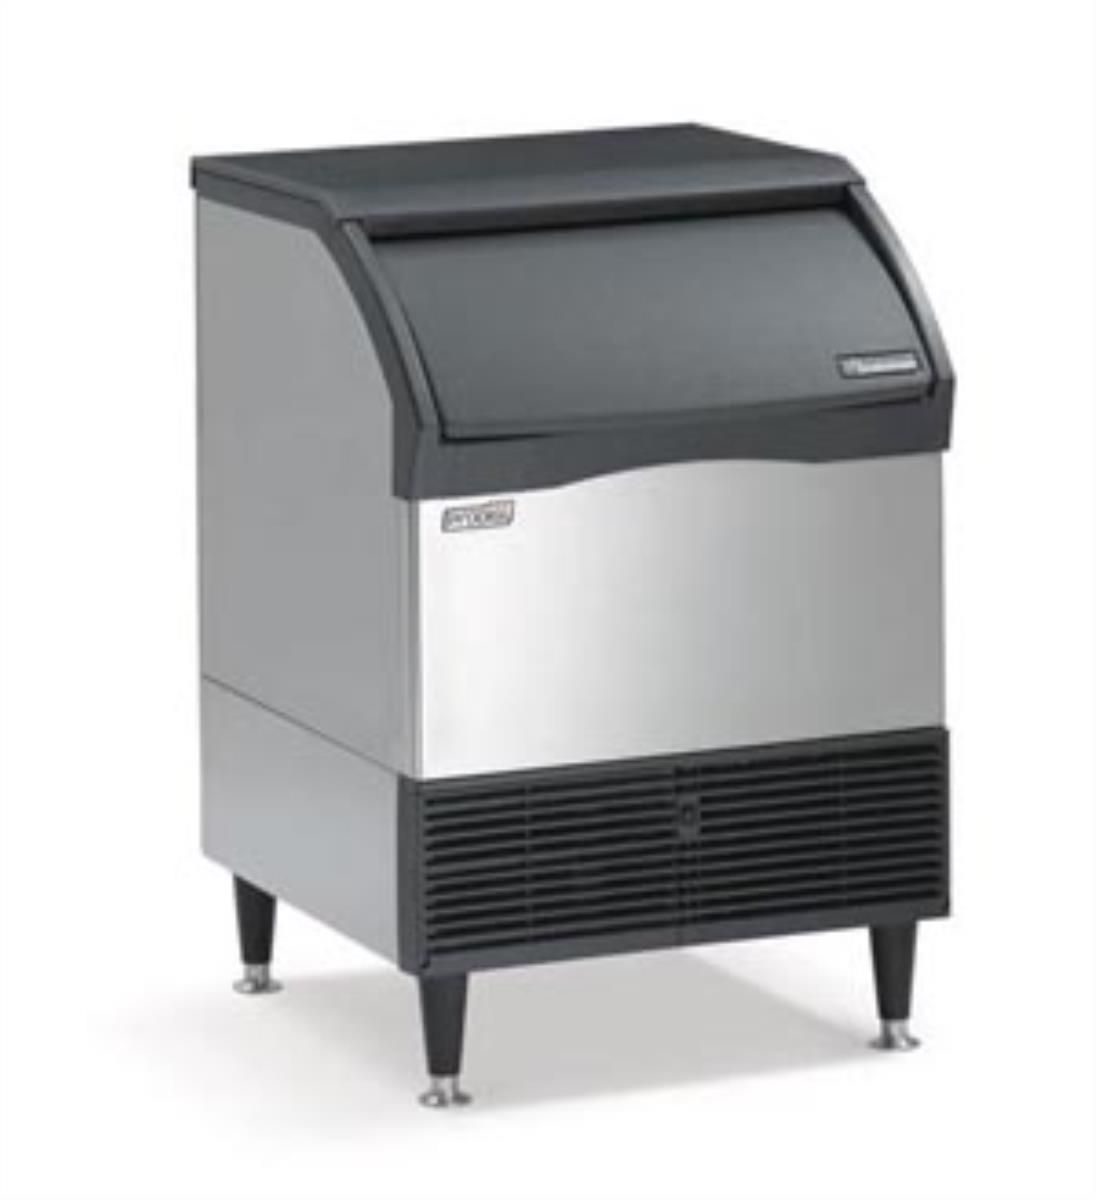 Scotsman Cu1526 Prodigy 150 Pound Under Counter Ice Maker Ice Cube Maker Ice Maker Machine Ice Machine